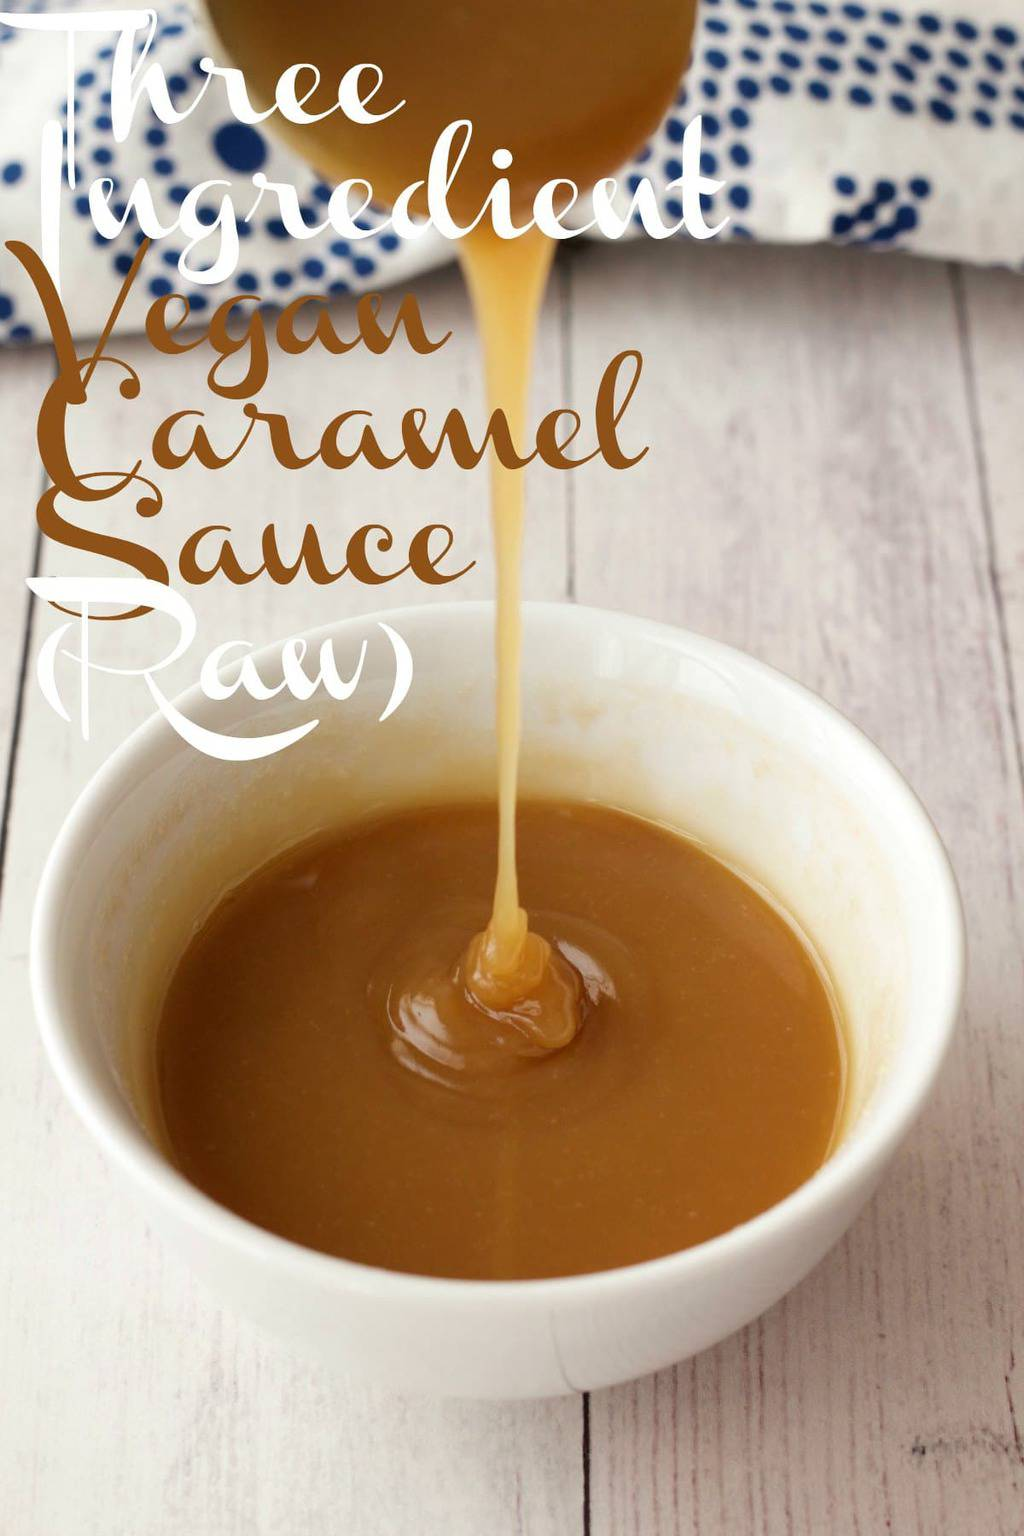 3-Ingredient Vegan Caramel Sauce! #vegan #lovingitvegan #rawvegan #caramelsauce #dessert